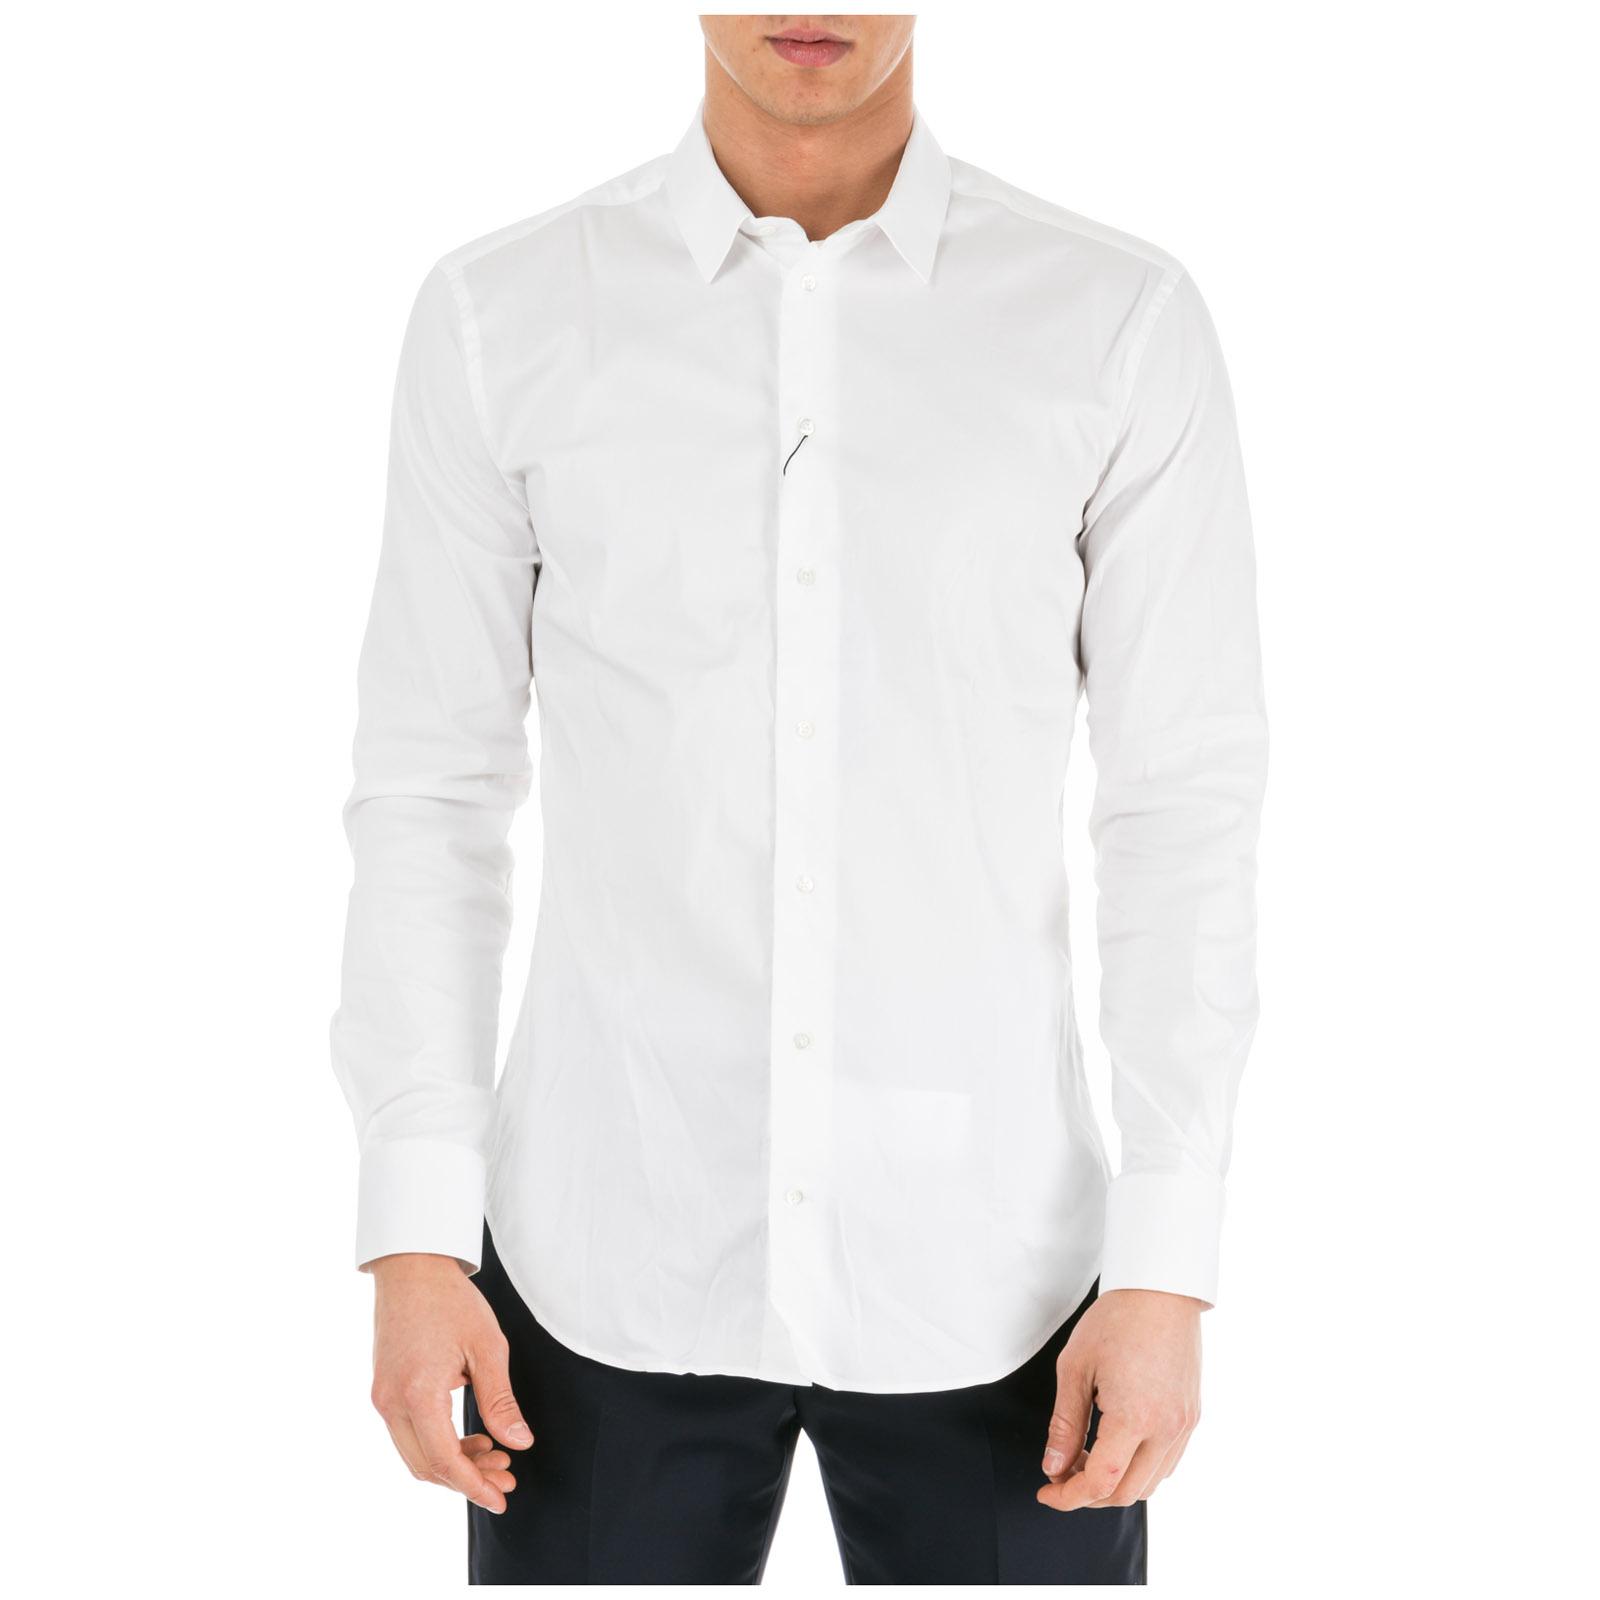 reputable site 18316 3a5f8 Herrenhemd hemd herren langarm langarmhemd slim fit